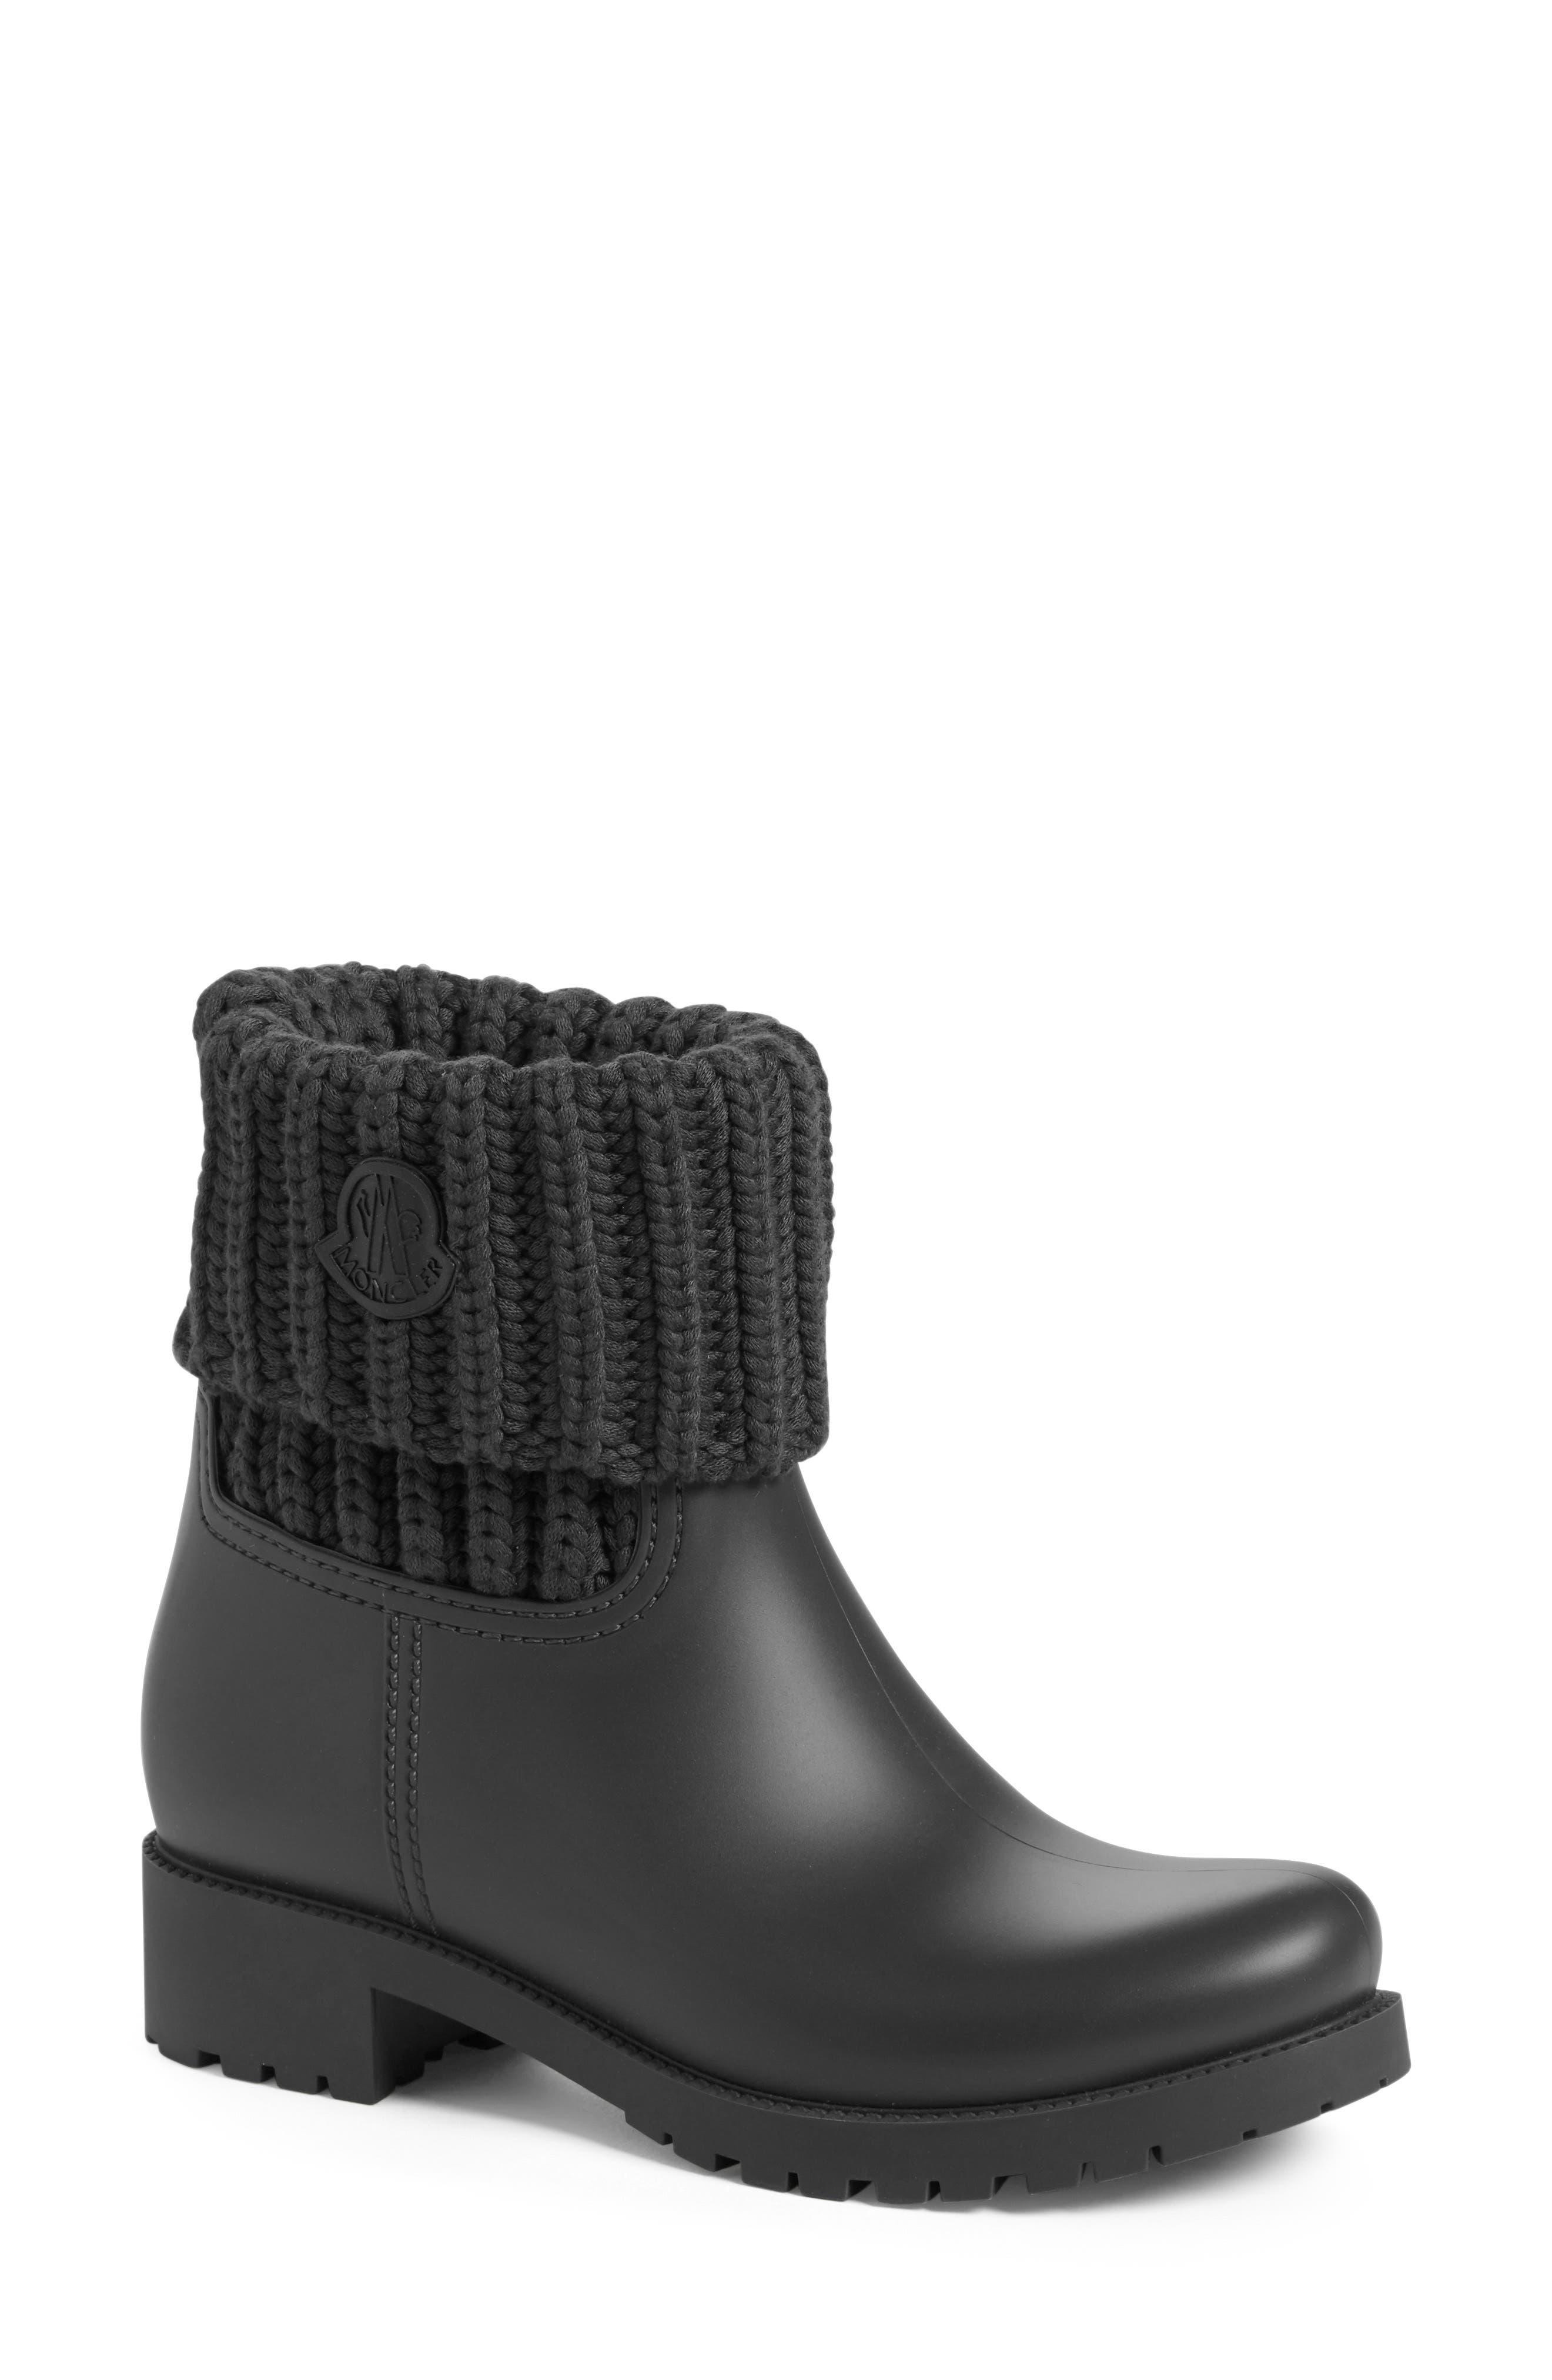 Ginette Knit Cuff Leather Rain Boot,                         Main,                         color, 002